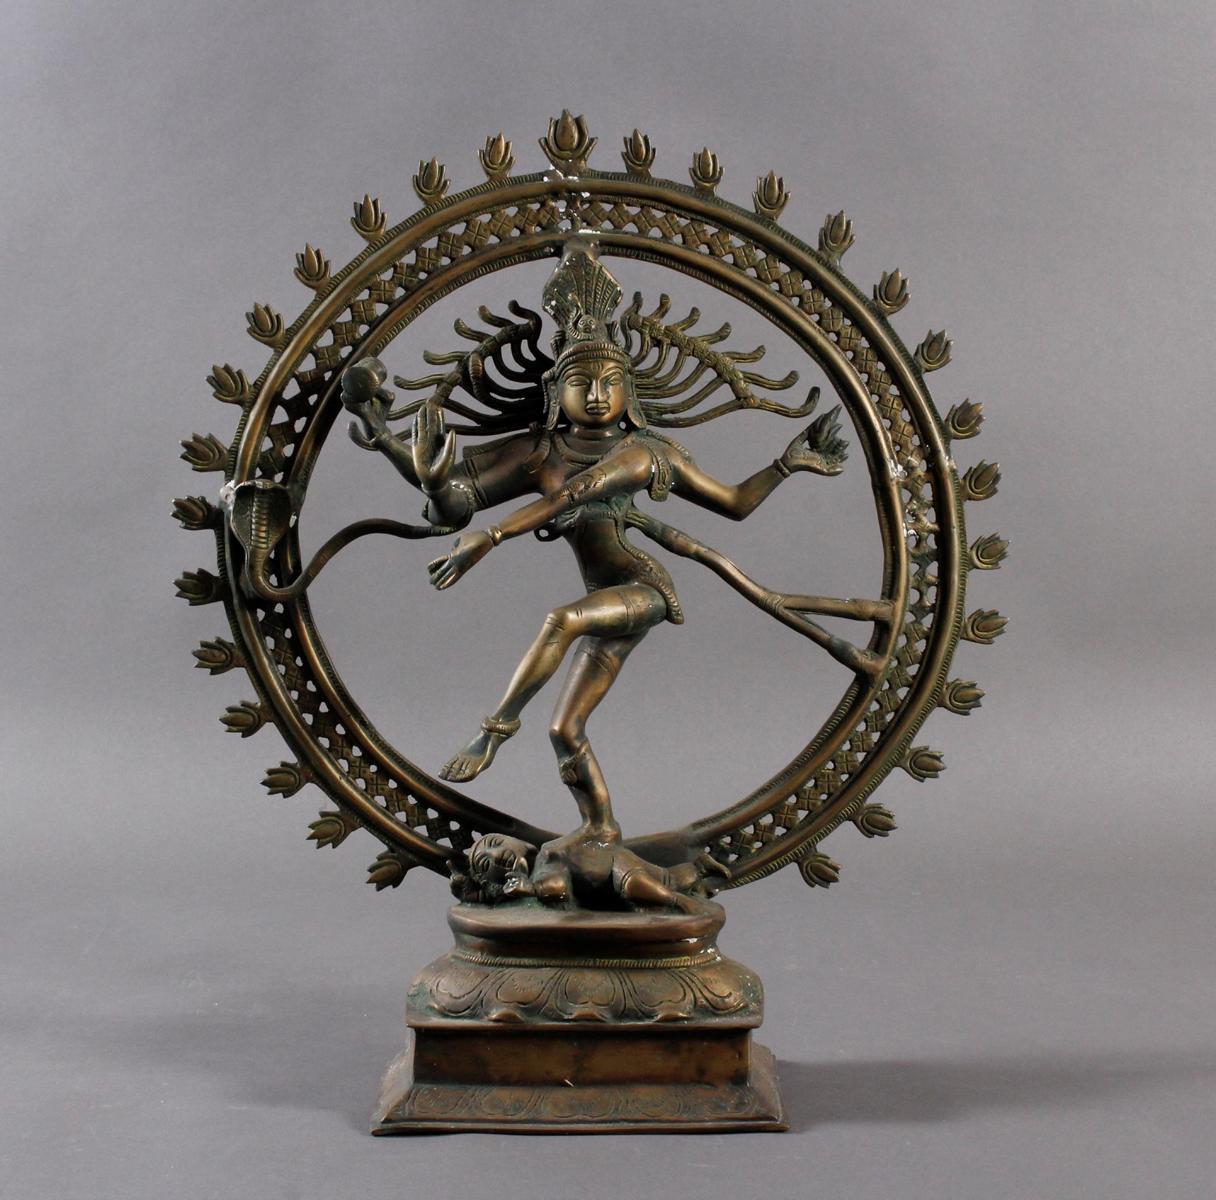 Nataraja Shiva im Flammenrad, Indien, 19. / 20. Jahrhundert